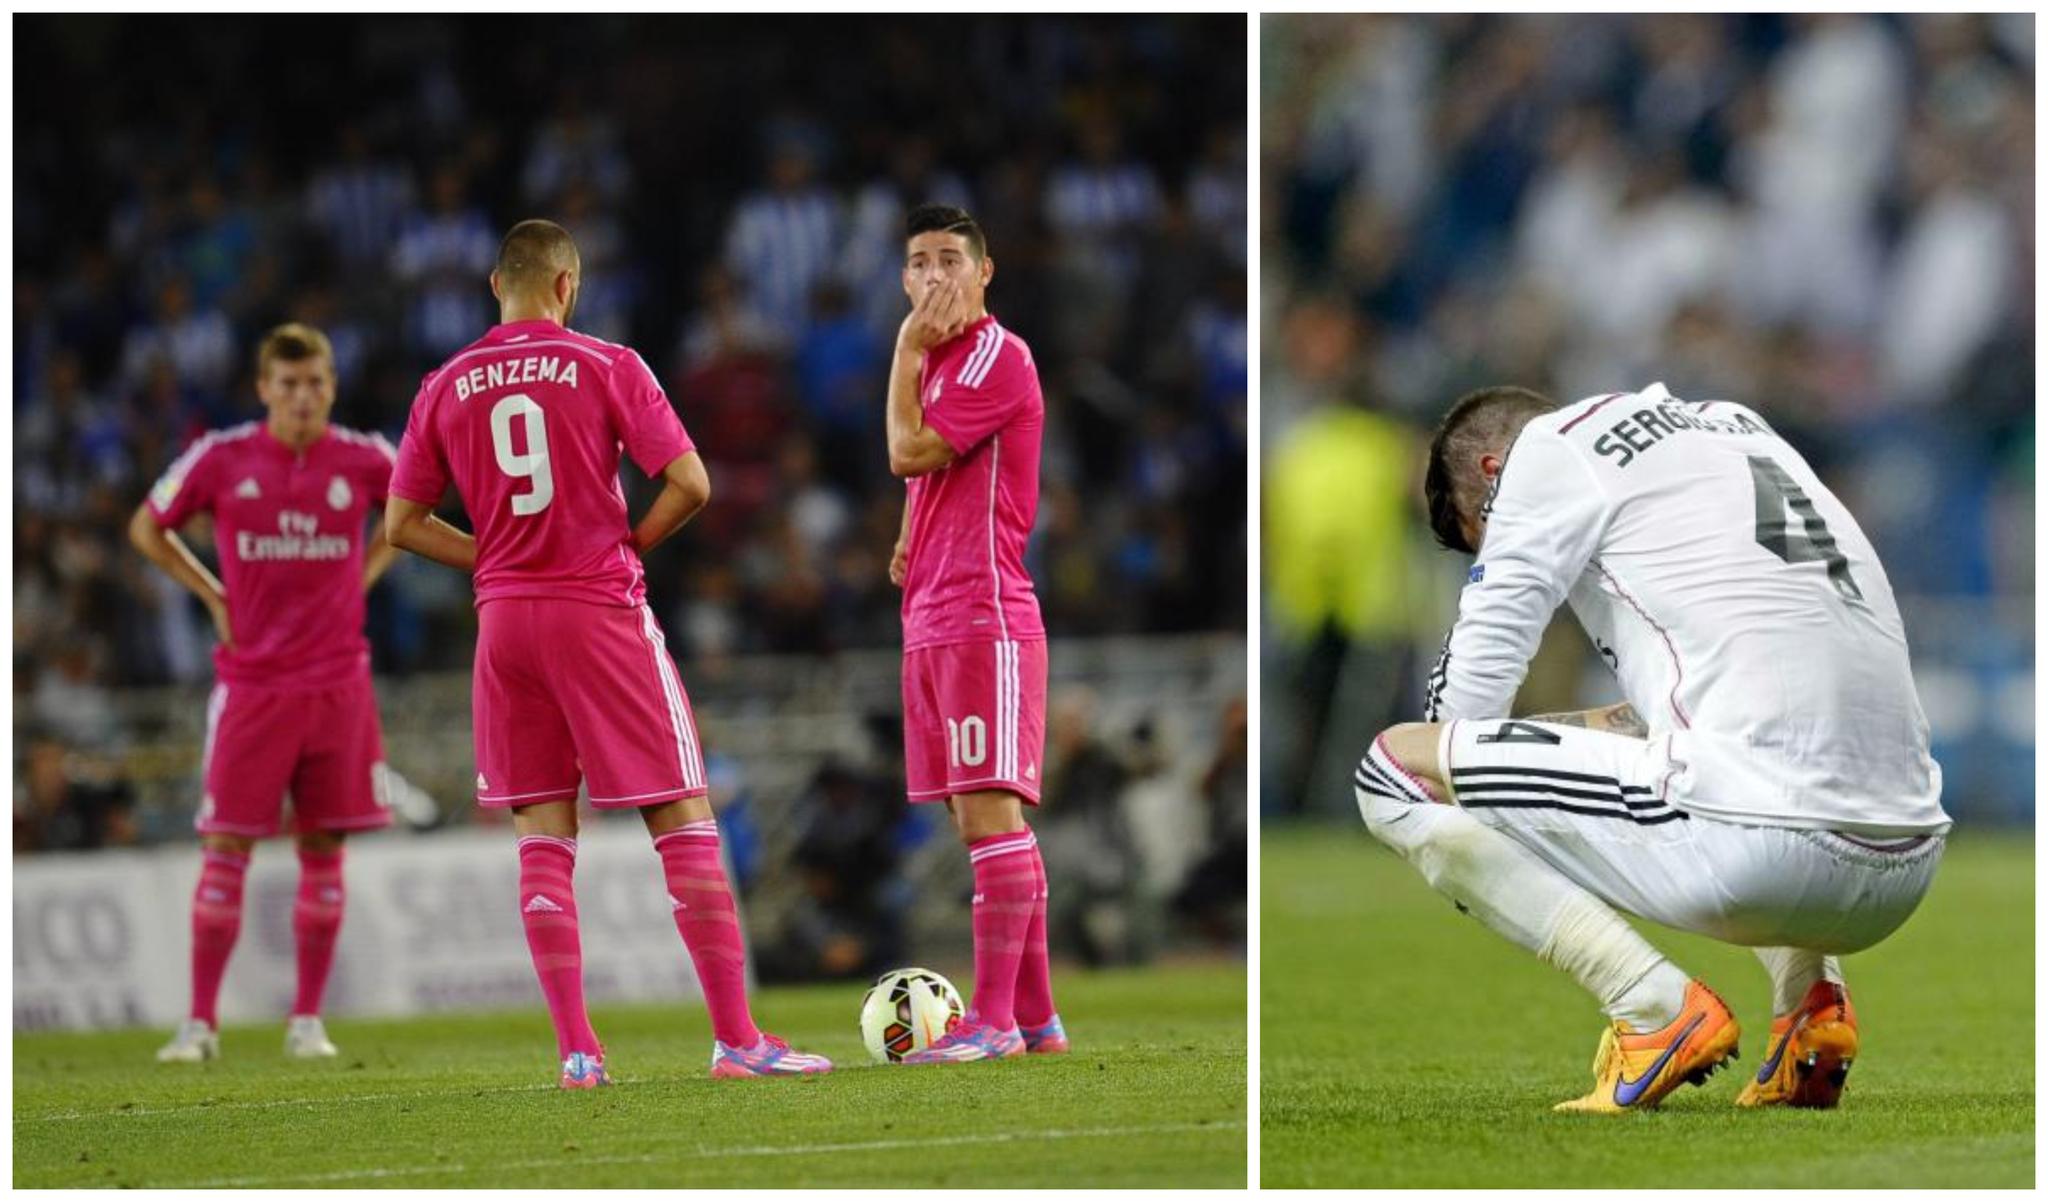 La camiseta rosa, el gafe del Real Madrid